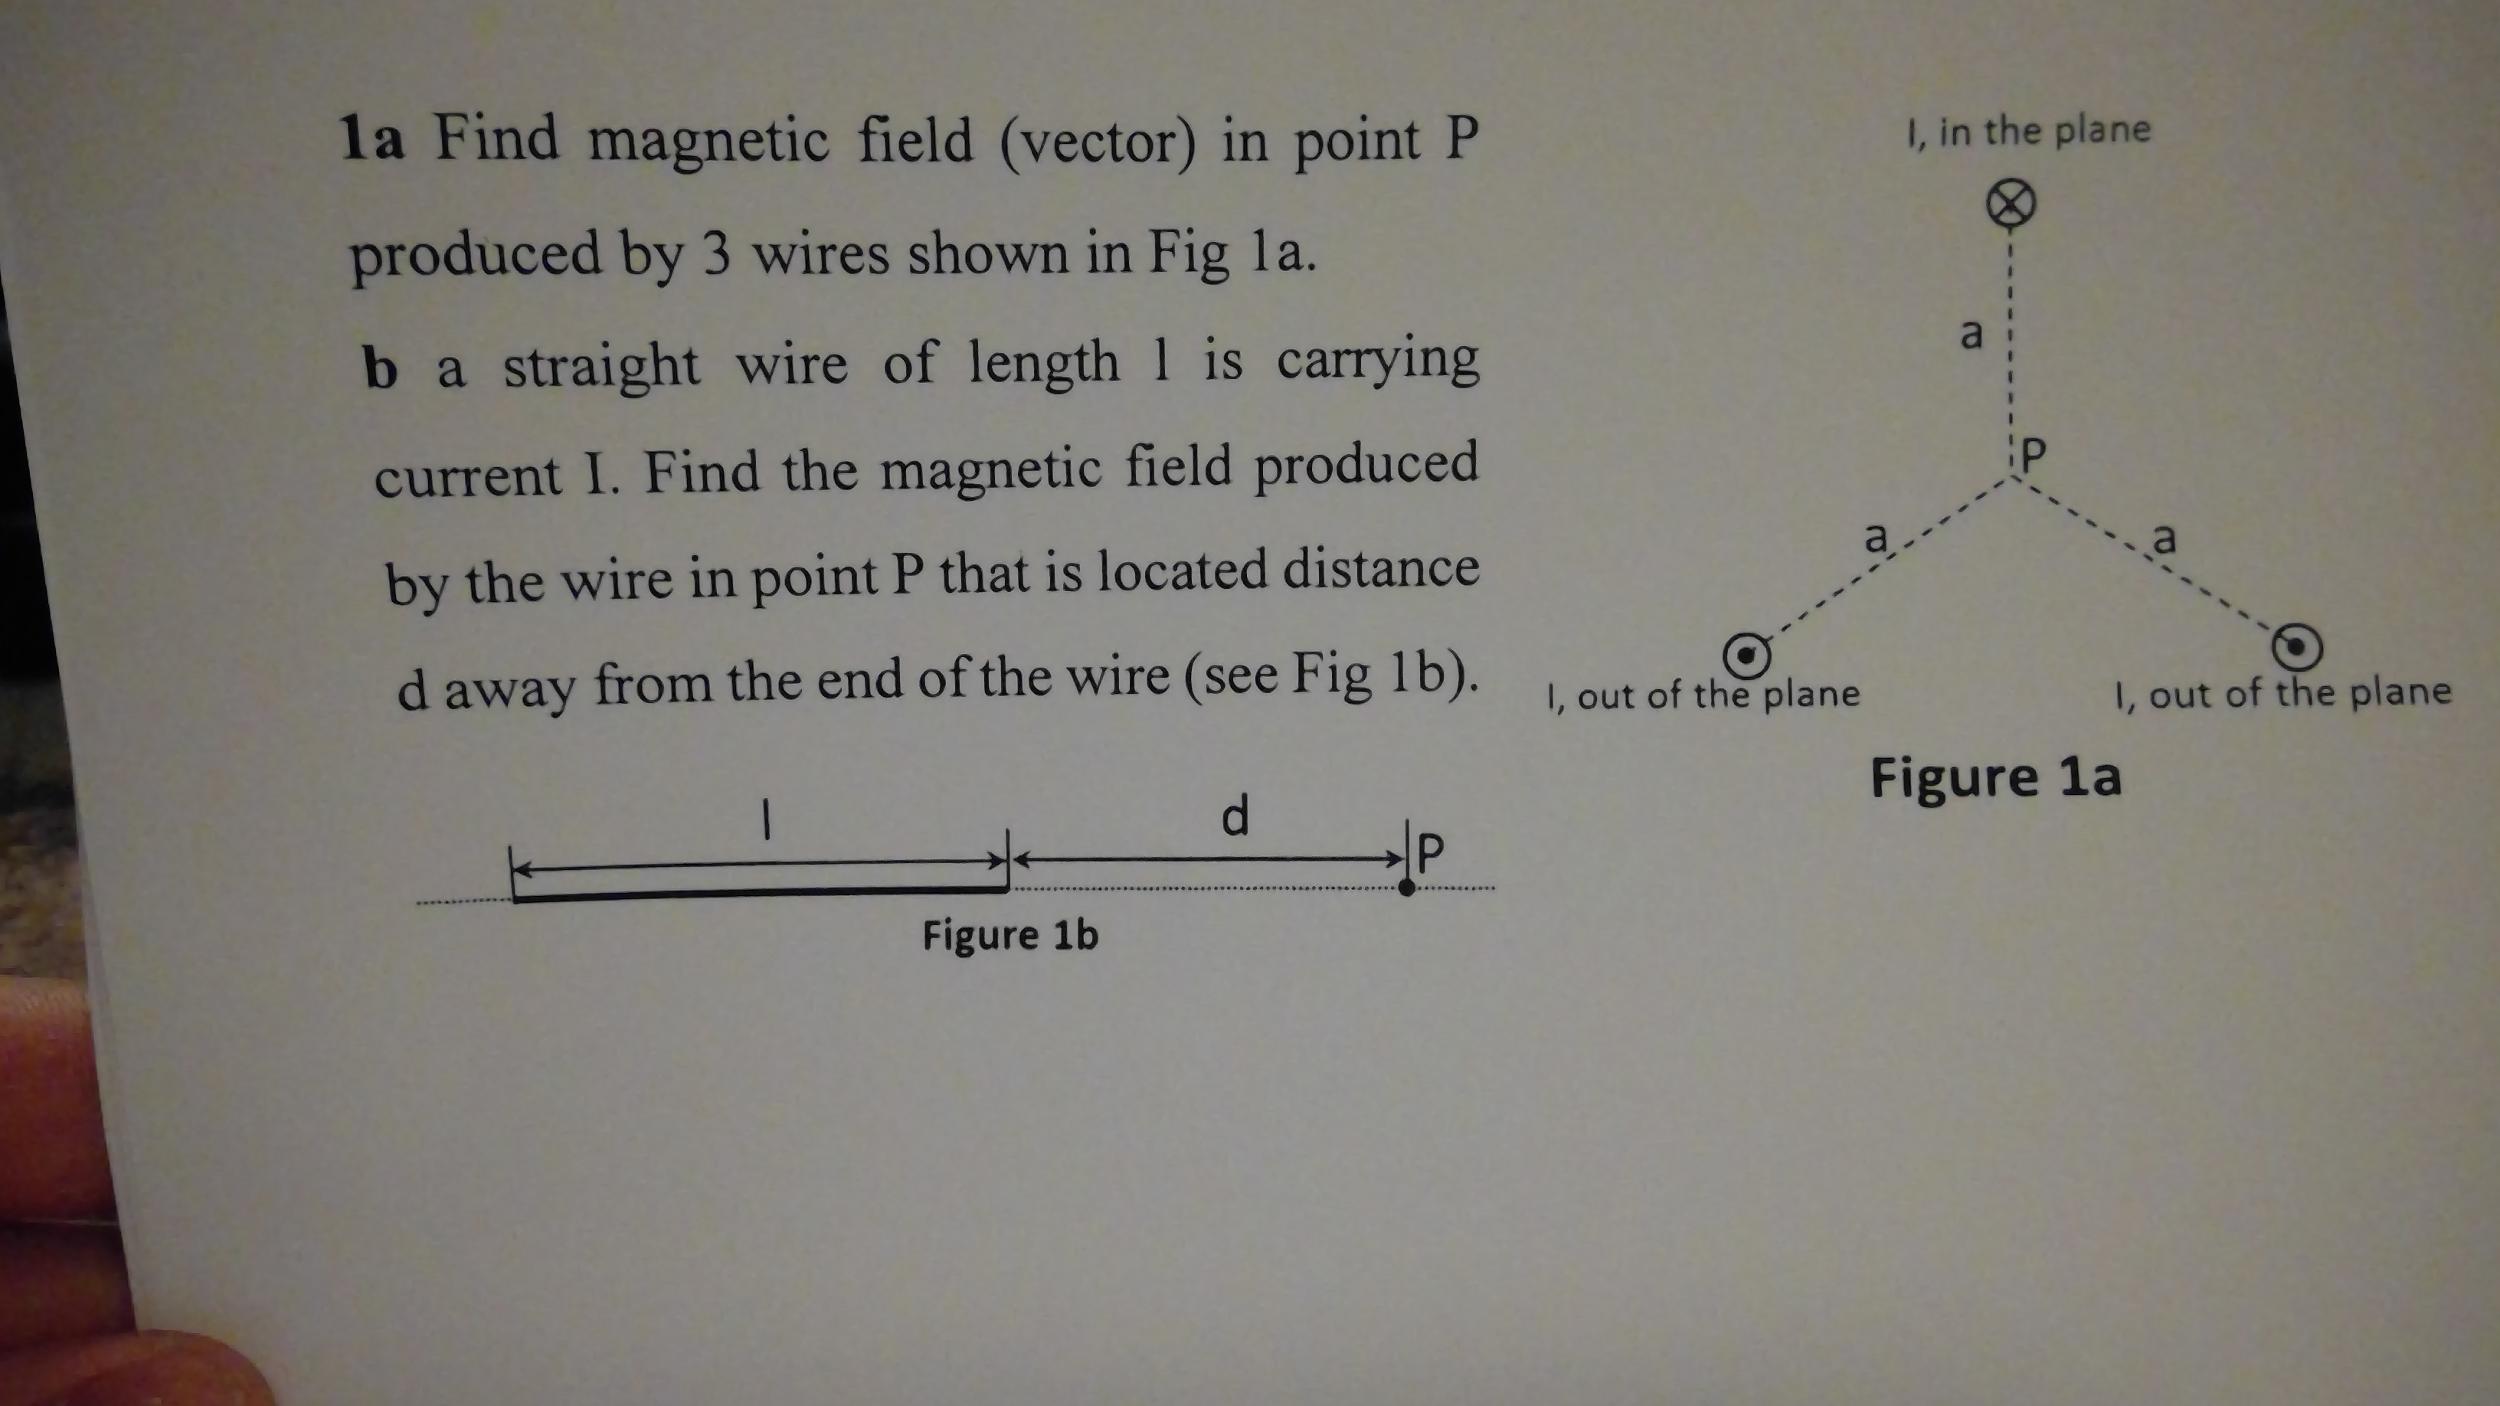 Physics Archive | July 26, 2016 | Chegg.com